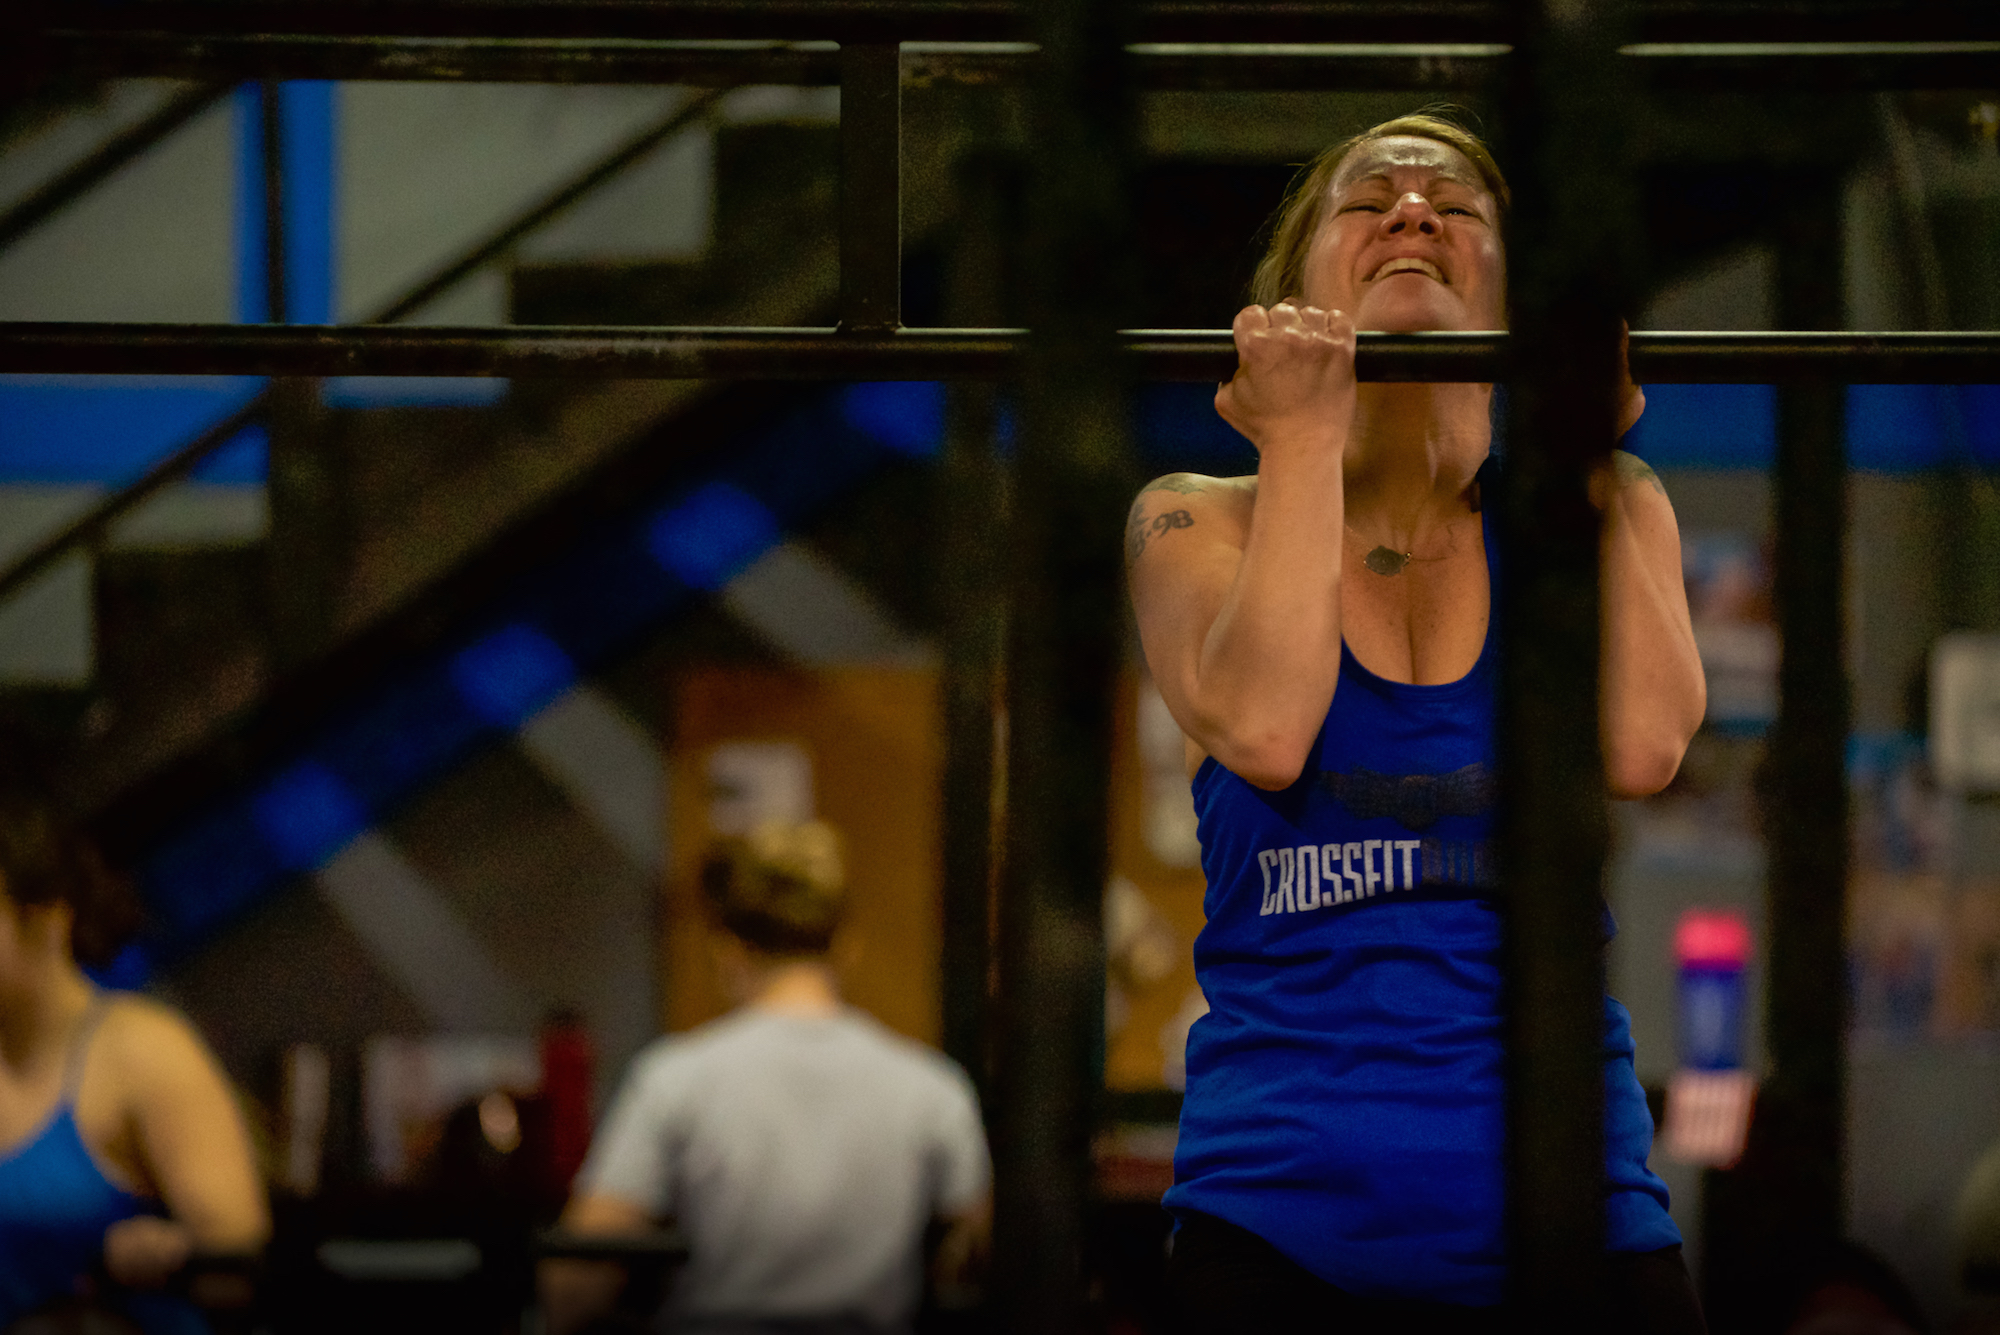 Crossfit forging elite fitness wednesday